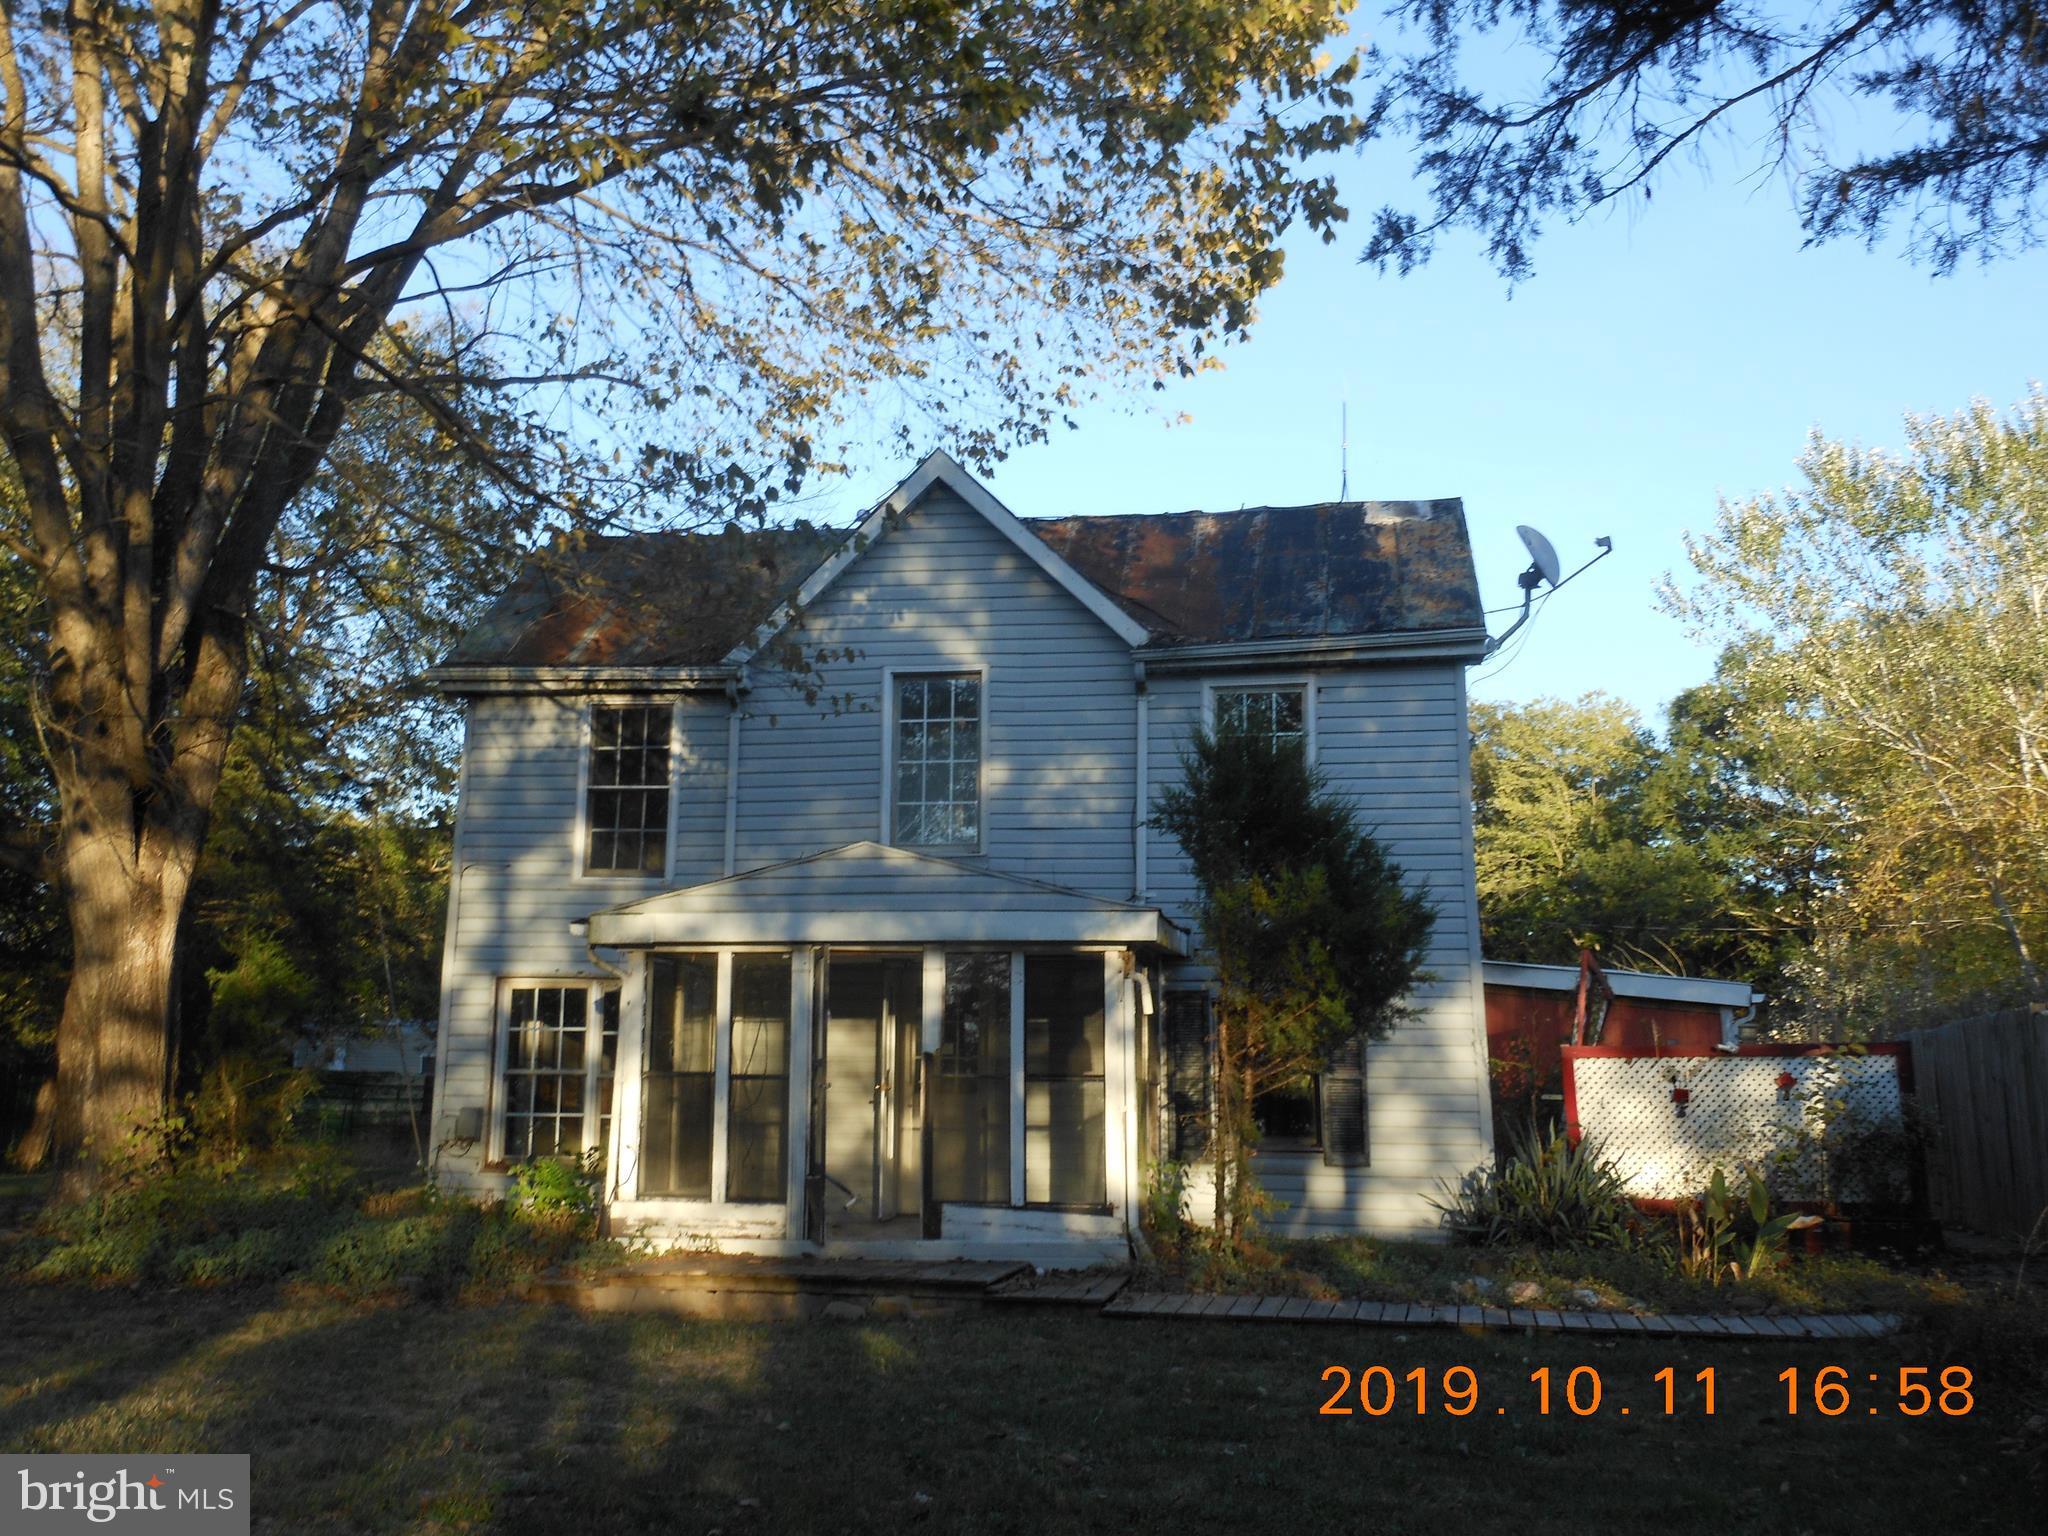 15139 Stevensburg Road, Brandy Station, VA 22714